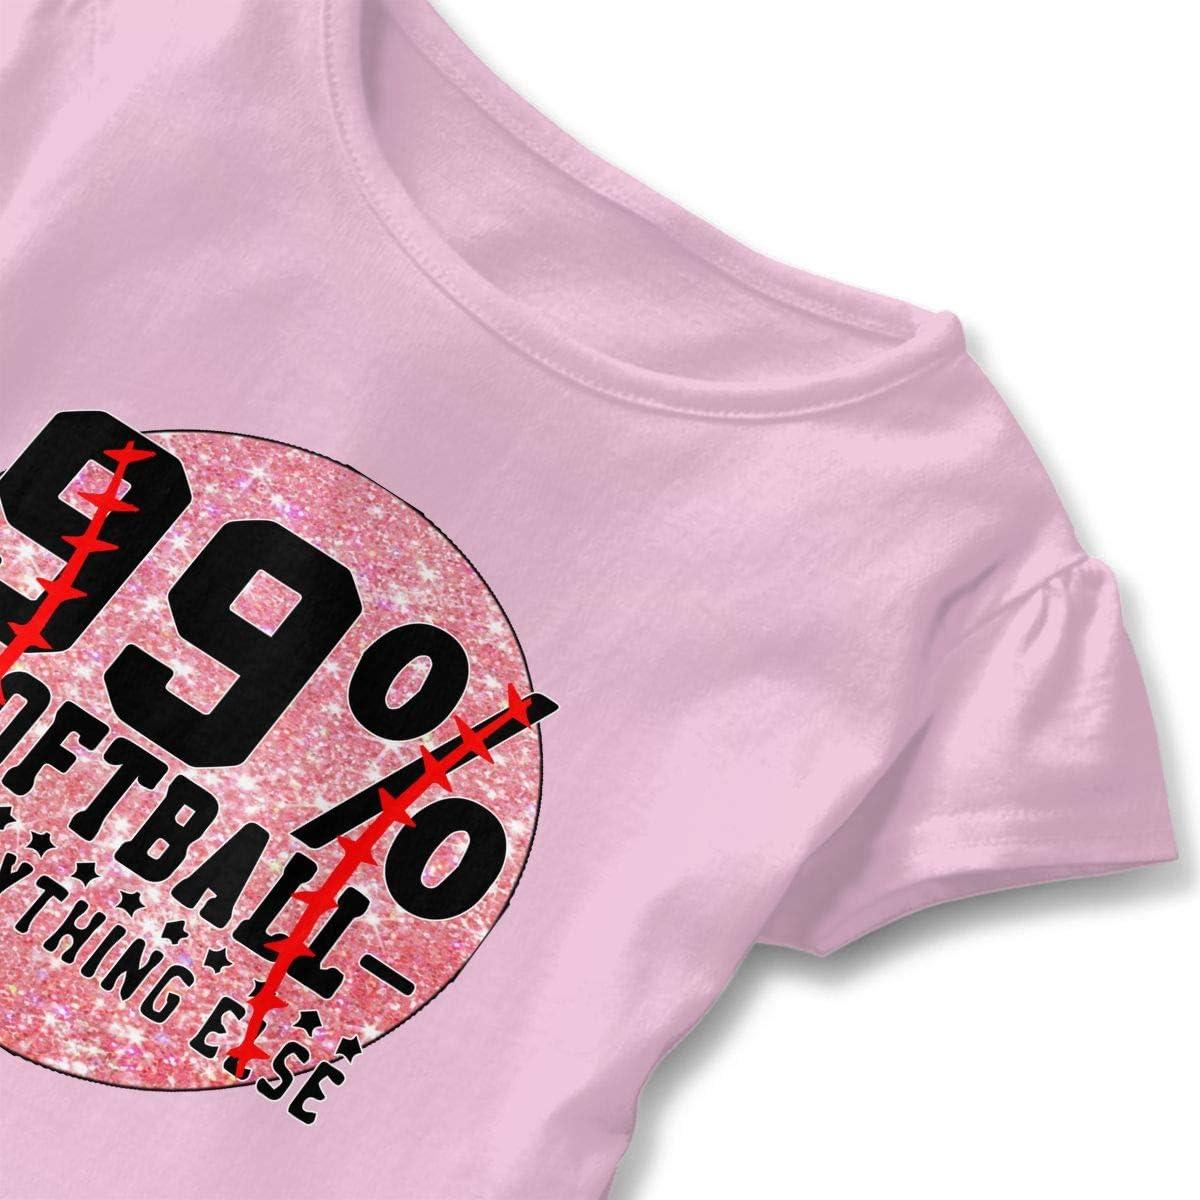 Cheng Jian Bo 99/% Softball 1/% Everything Else Toddler Girls T Shirt Kids Cotton Short Sleeve Ruffle Tee